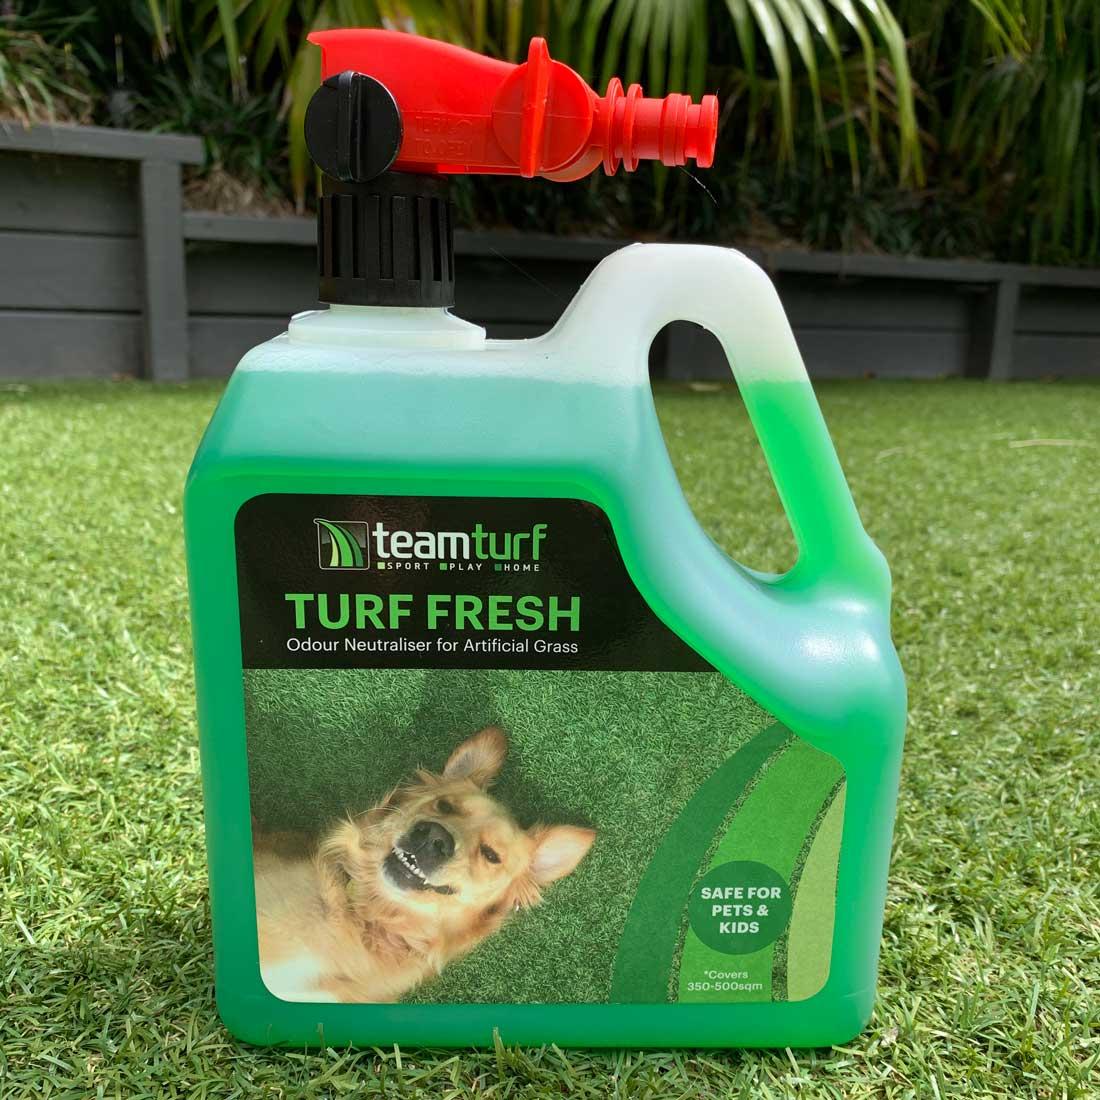 Turf Fresh Turf Deodoriser